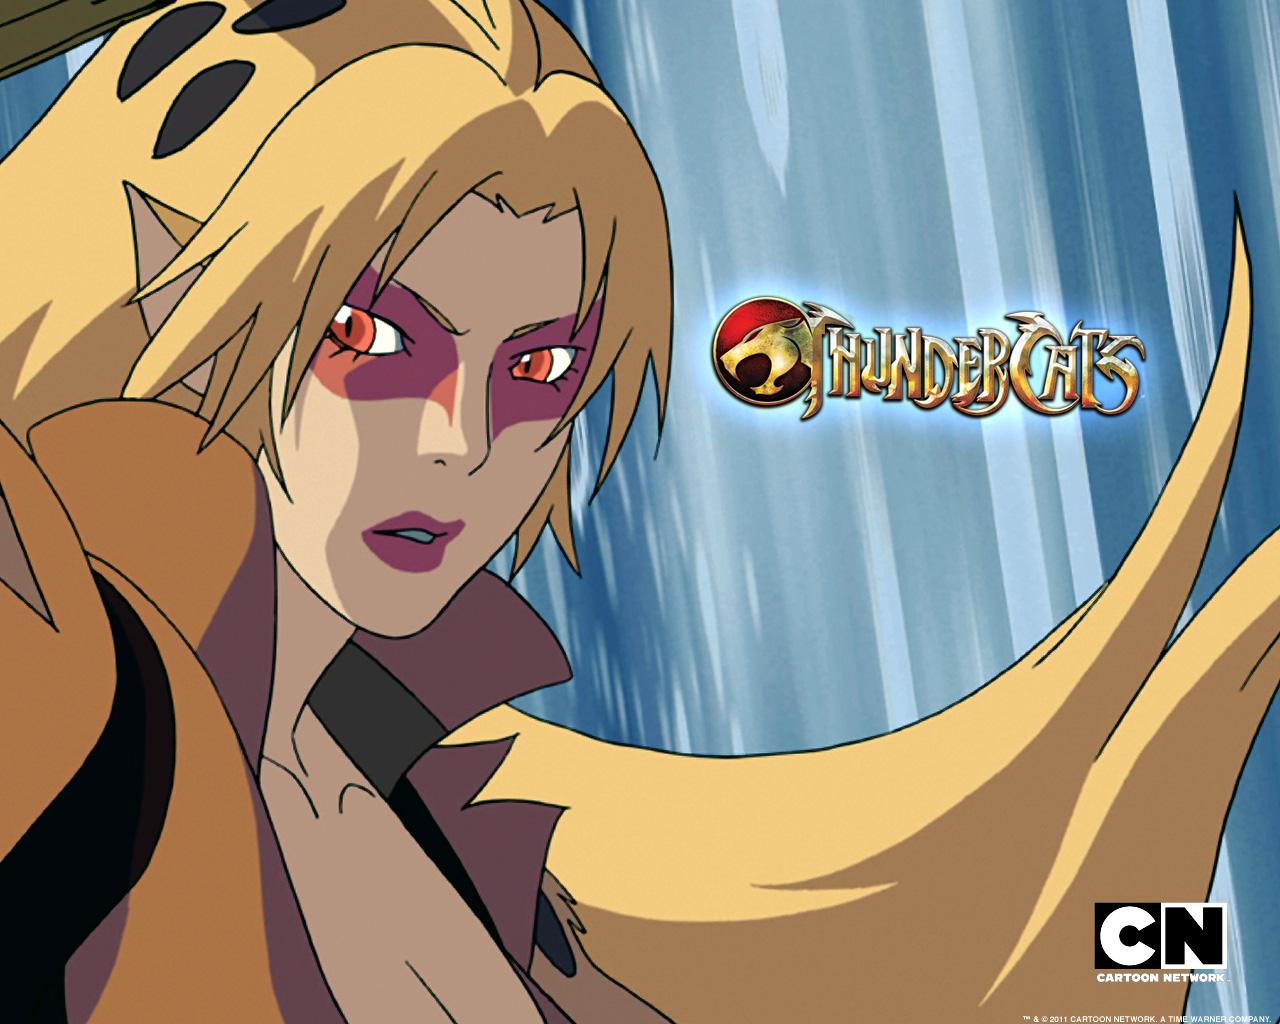 Thundercats палкомикс